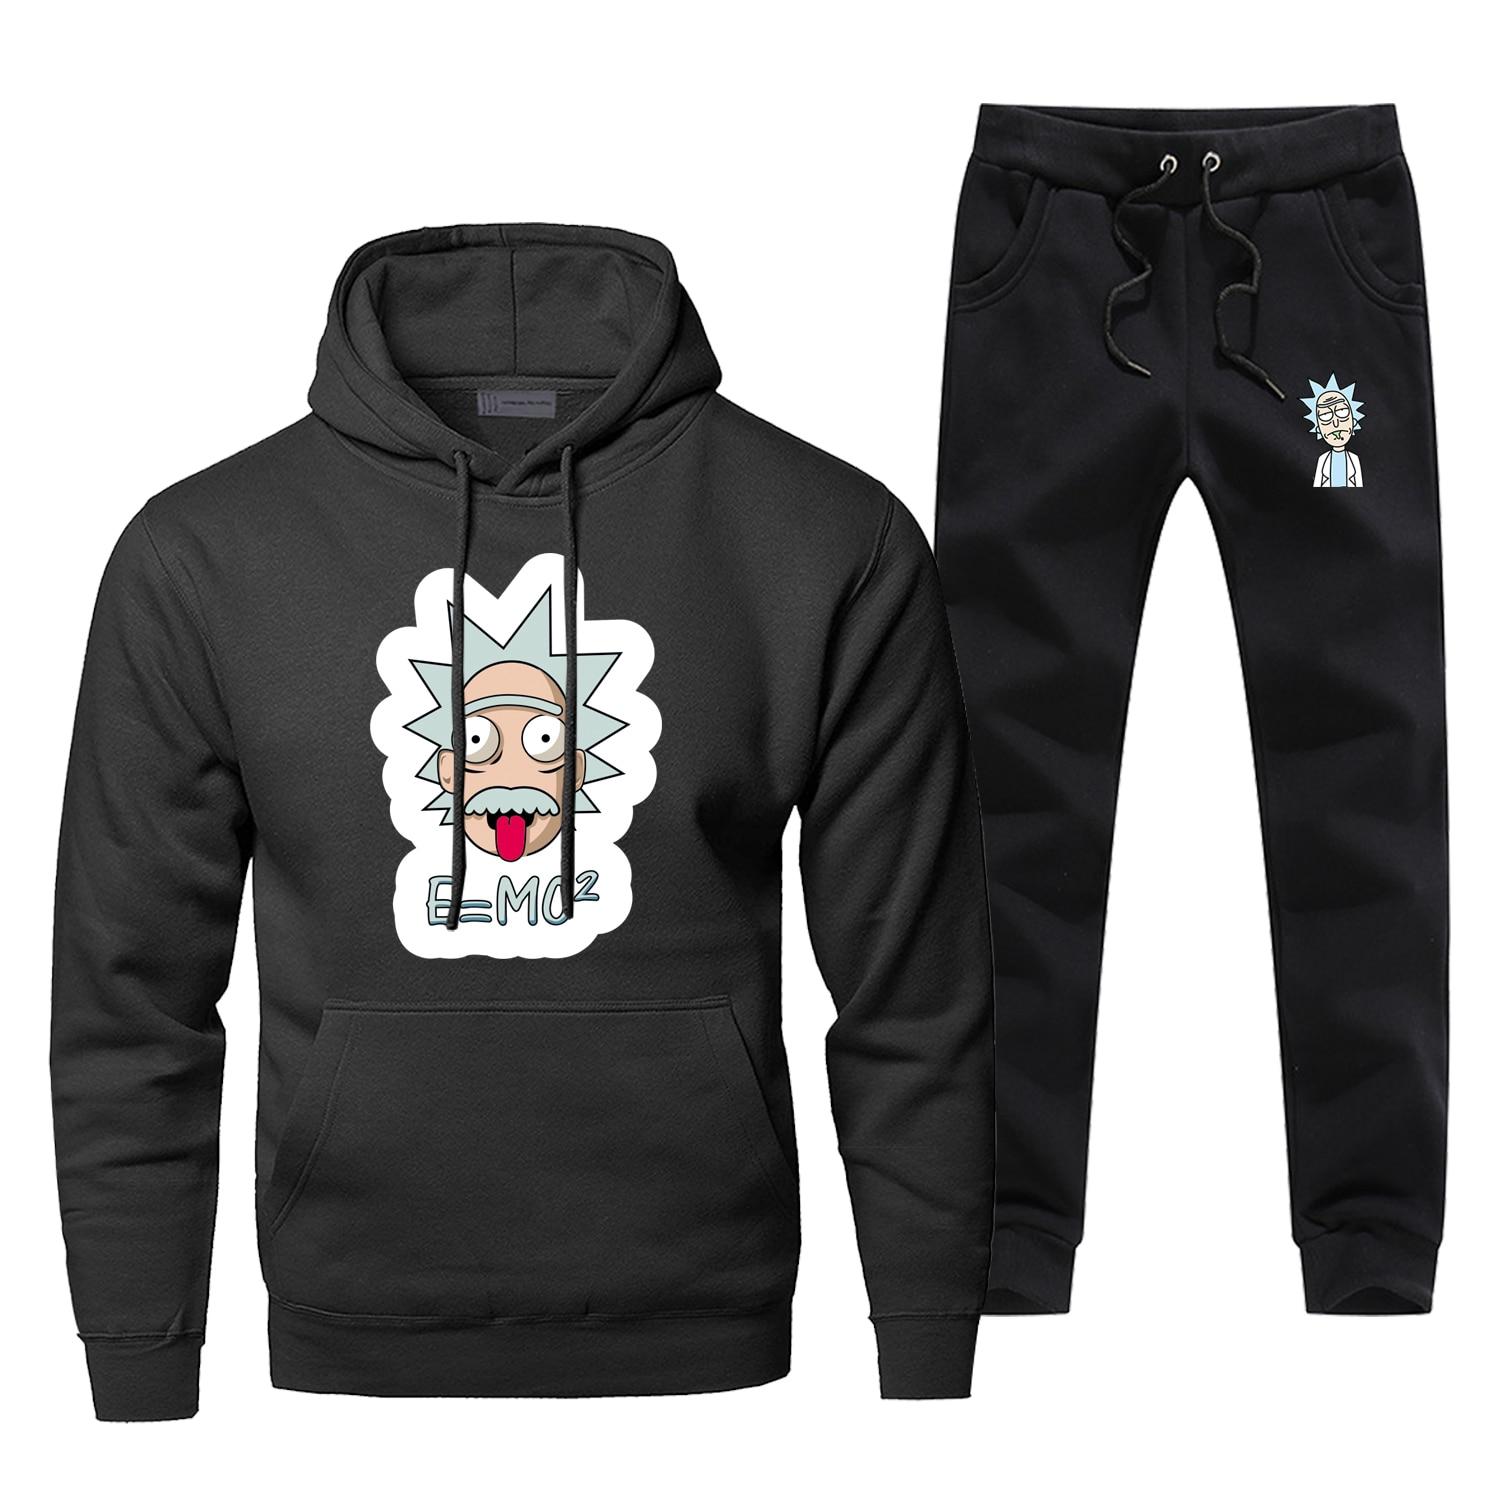 Einstein Rick And Morty Hoodie Pants Men Sets Suit Funny Set Pant Sweatshirt Sweatpants Sportswear Autumn Caroon 2 PCS Tracksuit